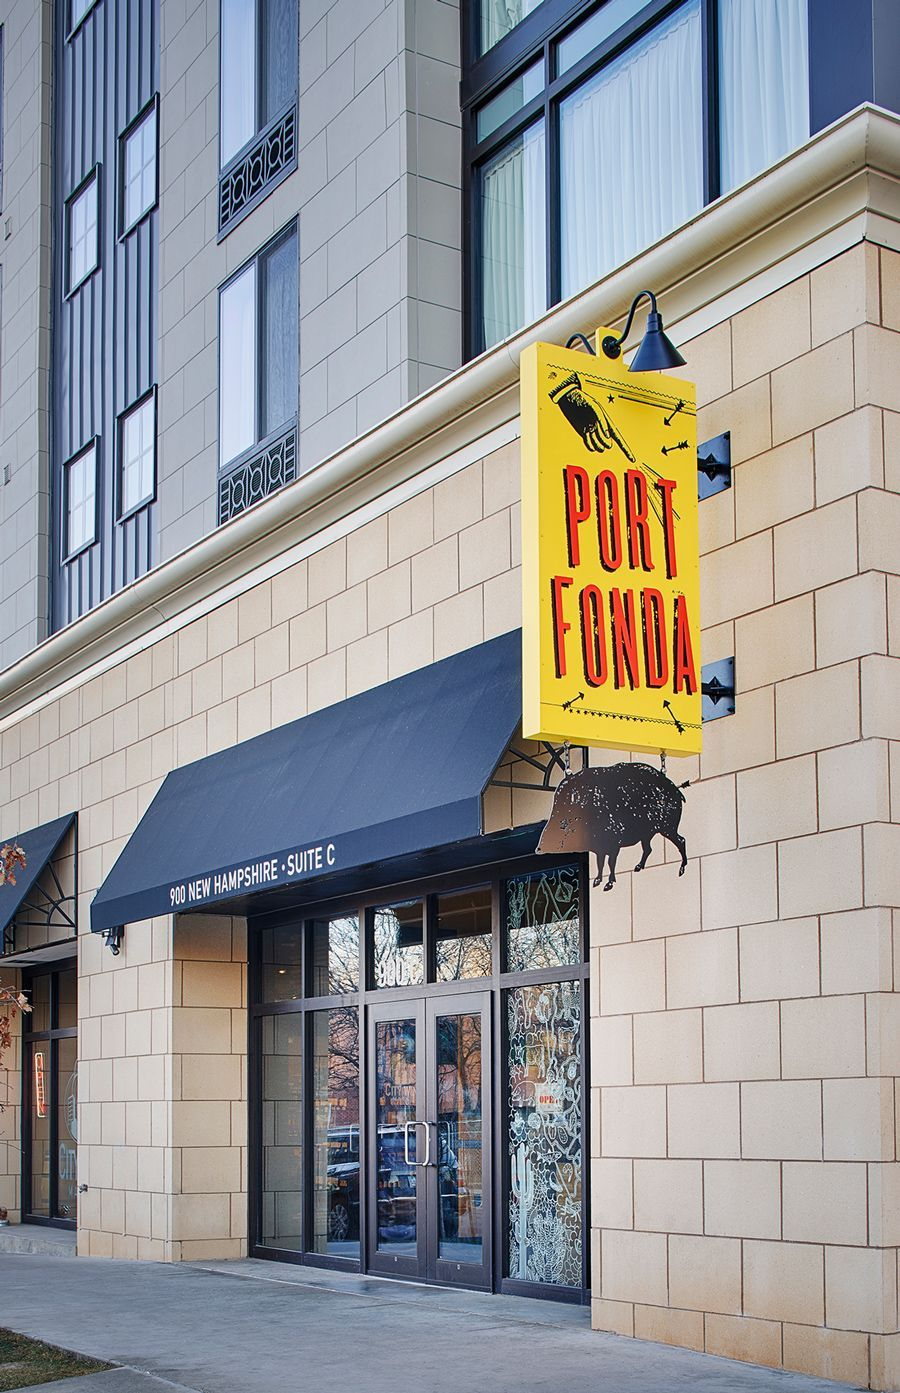 SSWeb-Port Fonda-Blade Sign Photo